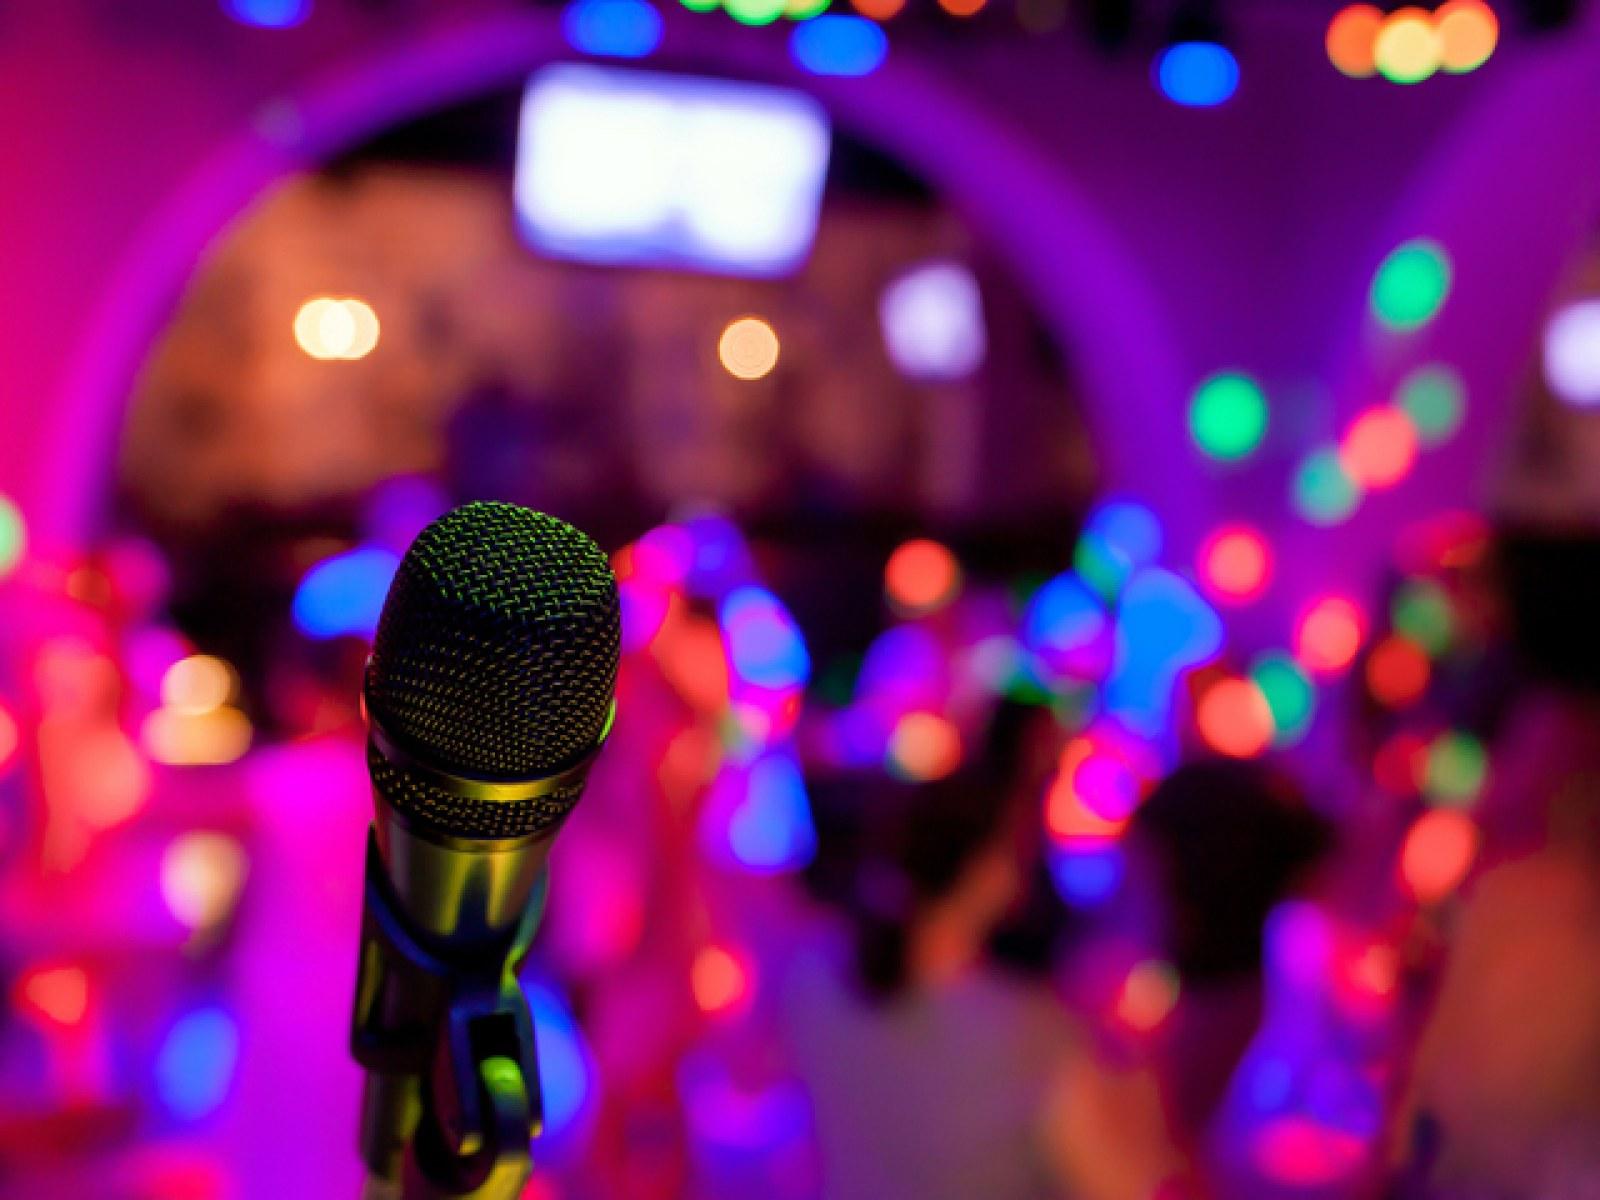 Background cho phòng hát karaoke